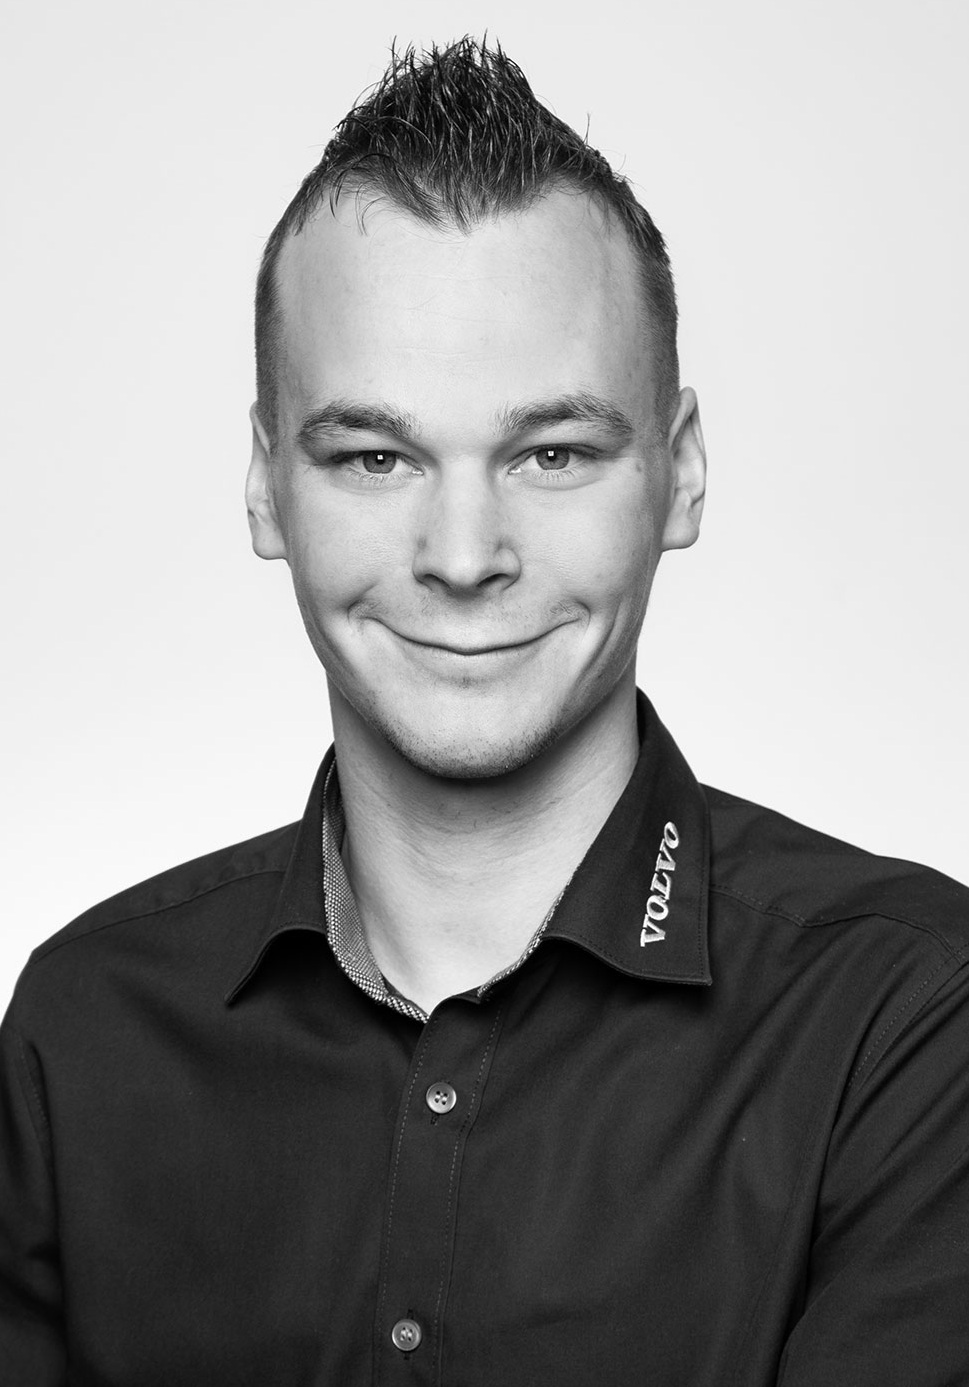 Serviceberater Dominik Eirich   Tel.: (0931) 2 70 04-15 eMail:  d.eirich@fabermobil.de